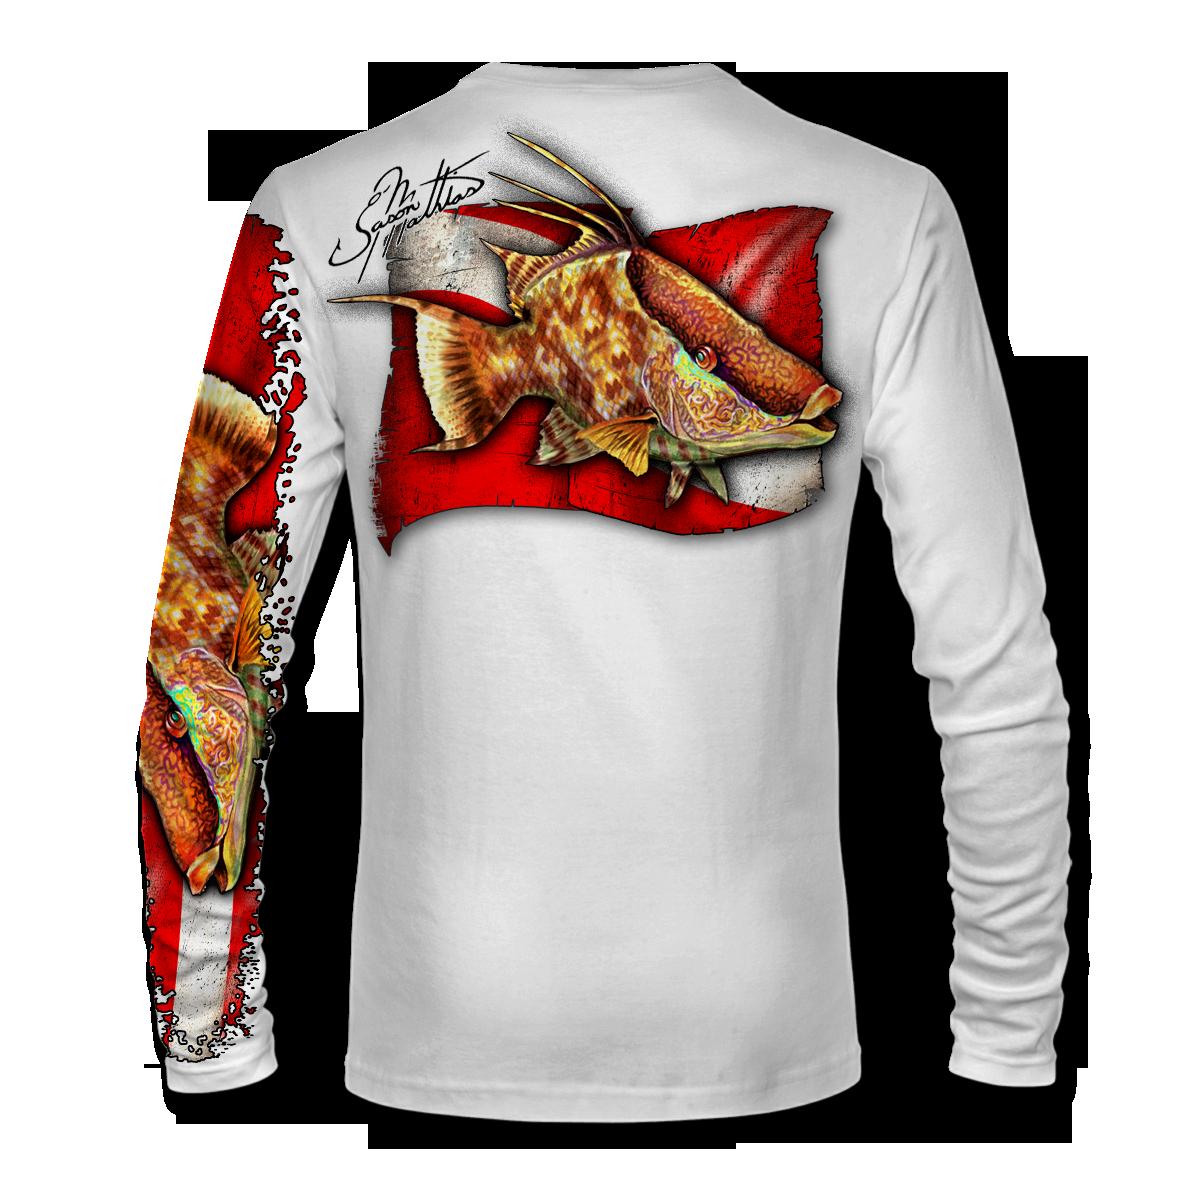 jason-mathias-shirts-white-apparel-gear-hogfish-dive-performance.png